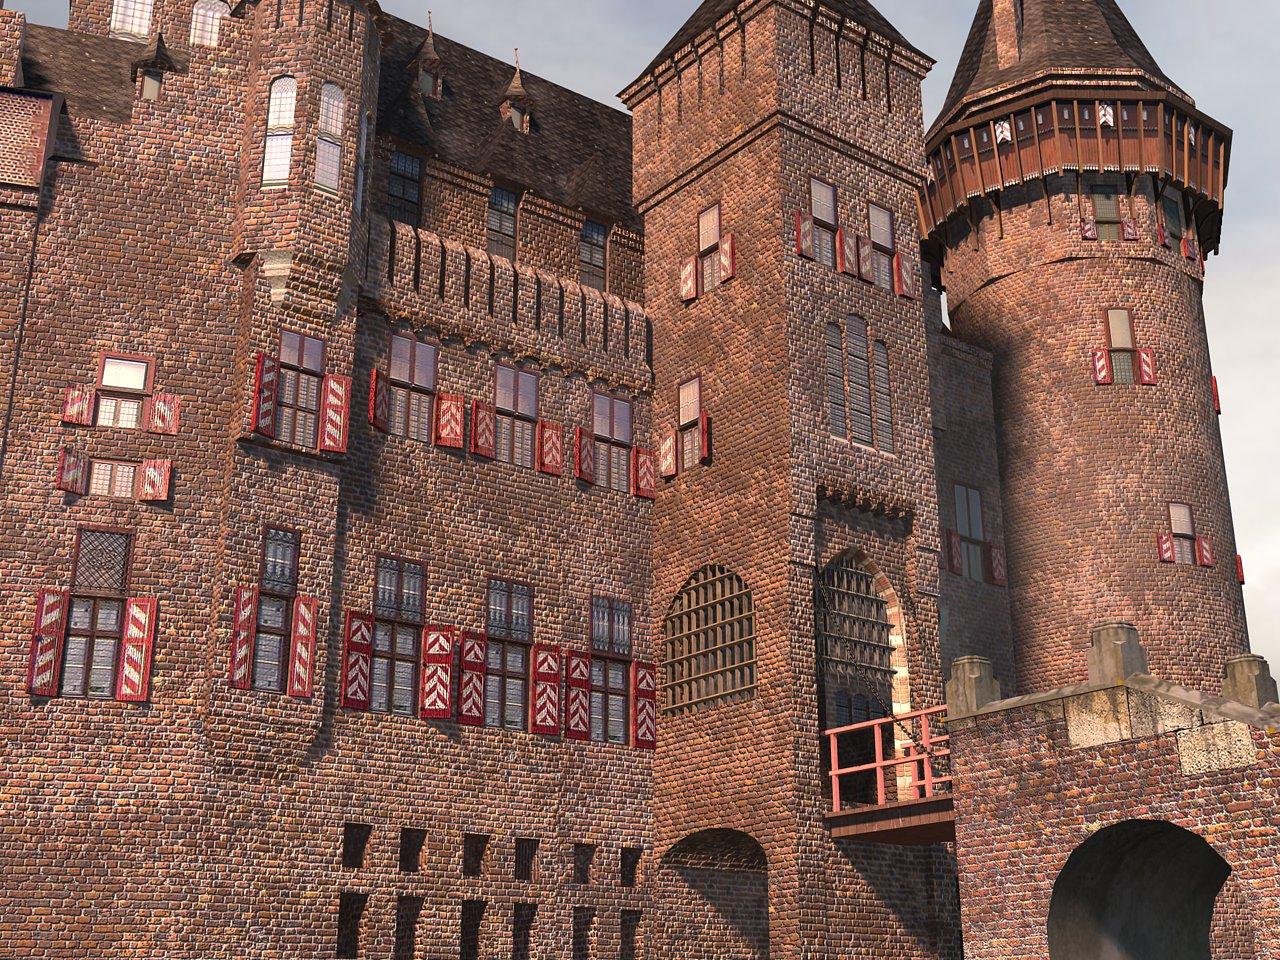 Castelul De Haar, detalii arhitecturale